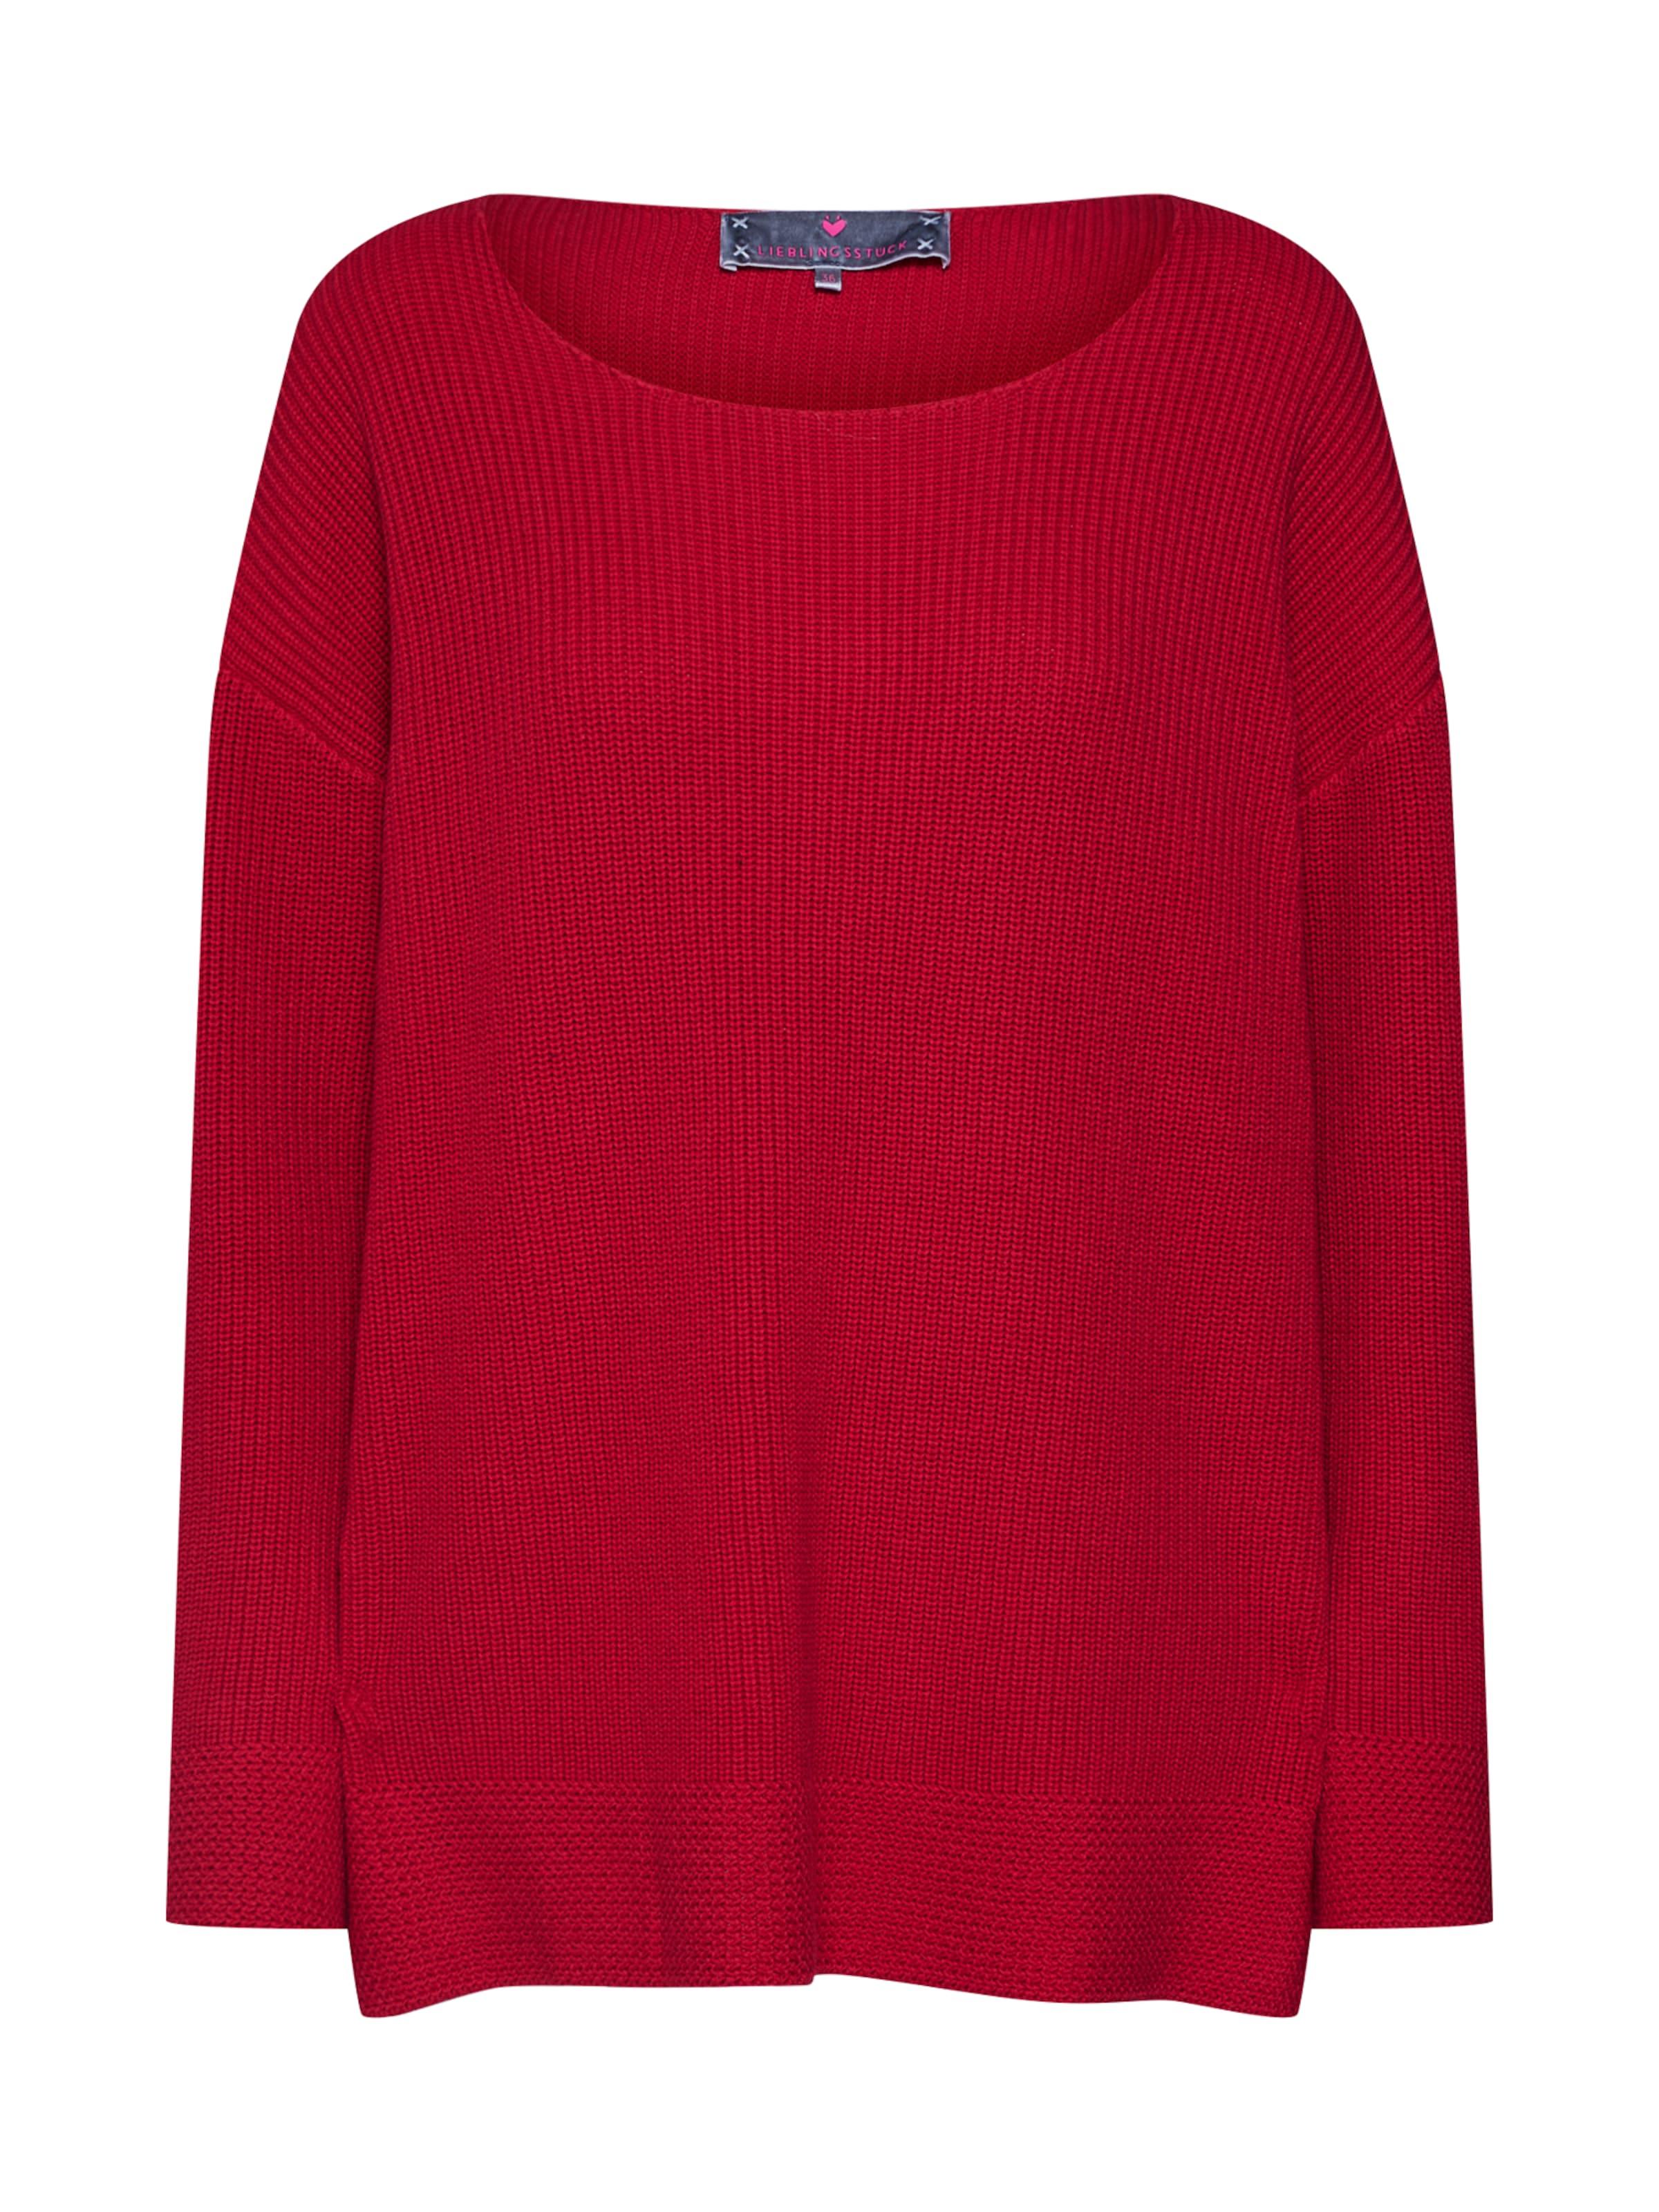 'abbyl' Pullover 'abbyl' Pullover Lieblingsstck Lieblingsstck In Rot N0vmn8w